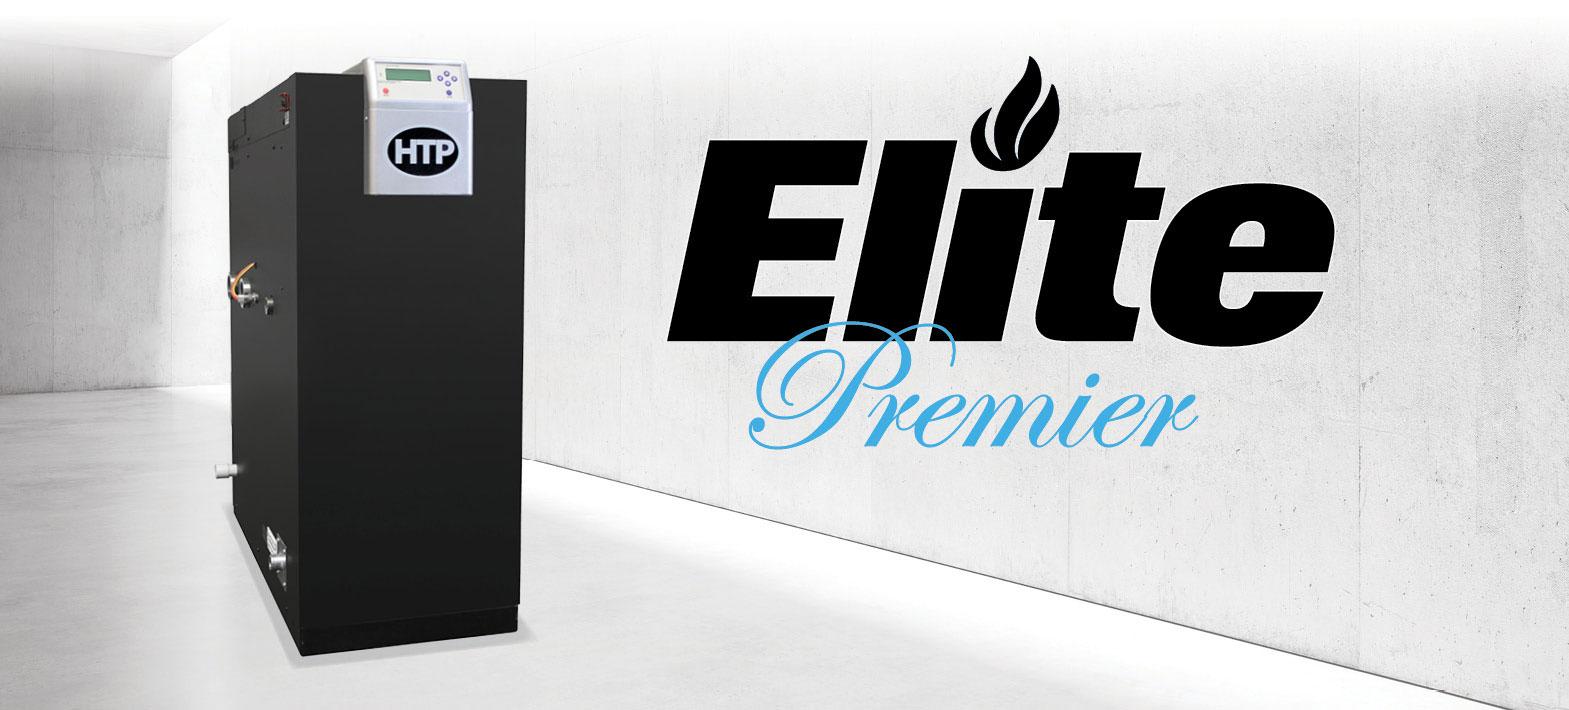 HTP - Elite Premier